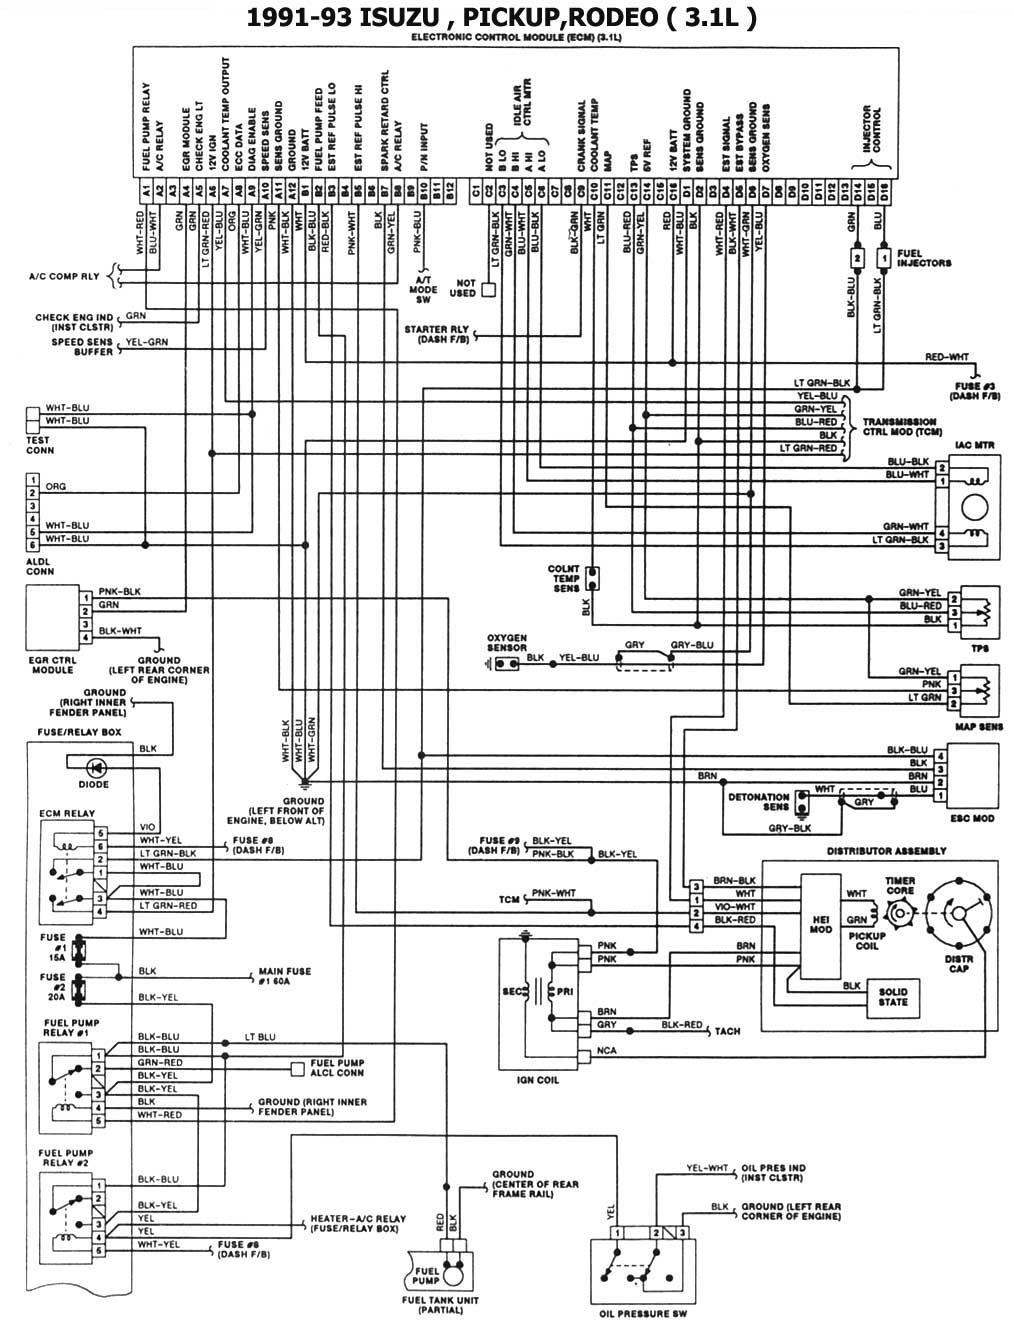 6E935F 91 Trooper Ecm Wiring Diagram | Wiring ResourcesWiring Resources